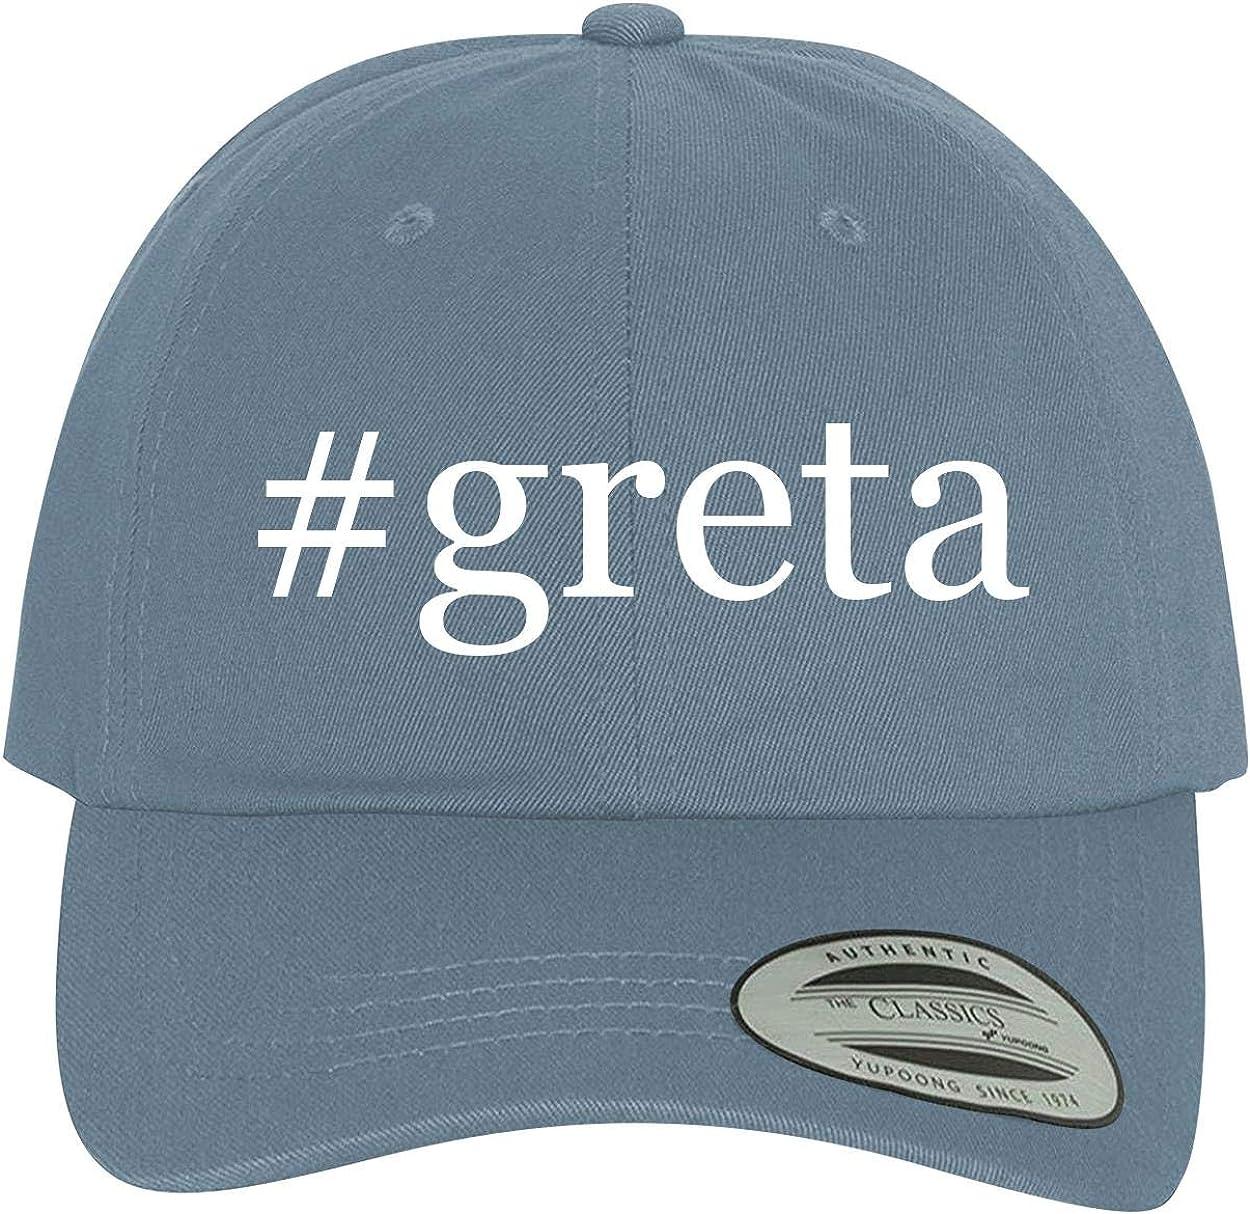 Comfortable Dad Hat Baseball Cap BH Cool Designs #Greta